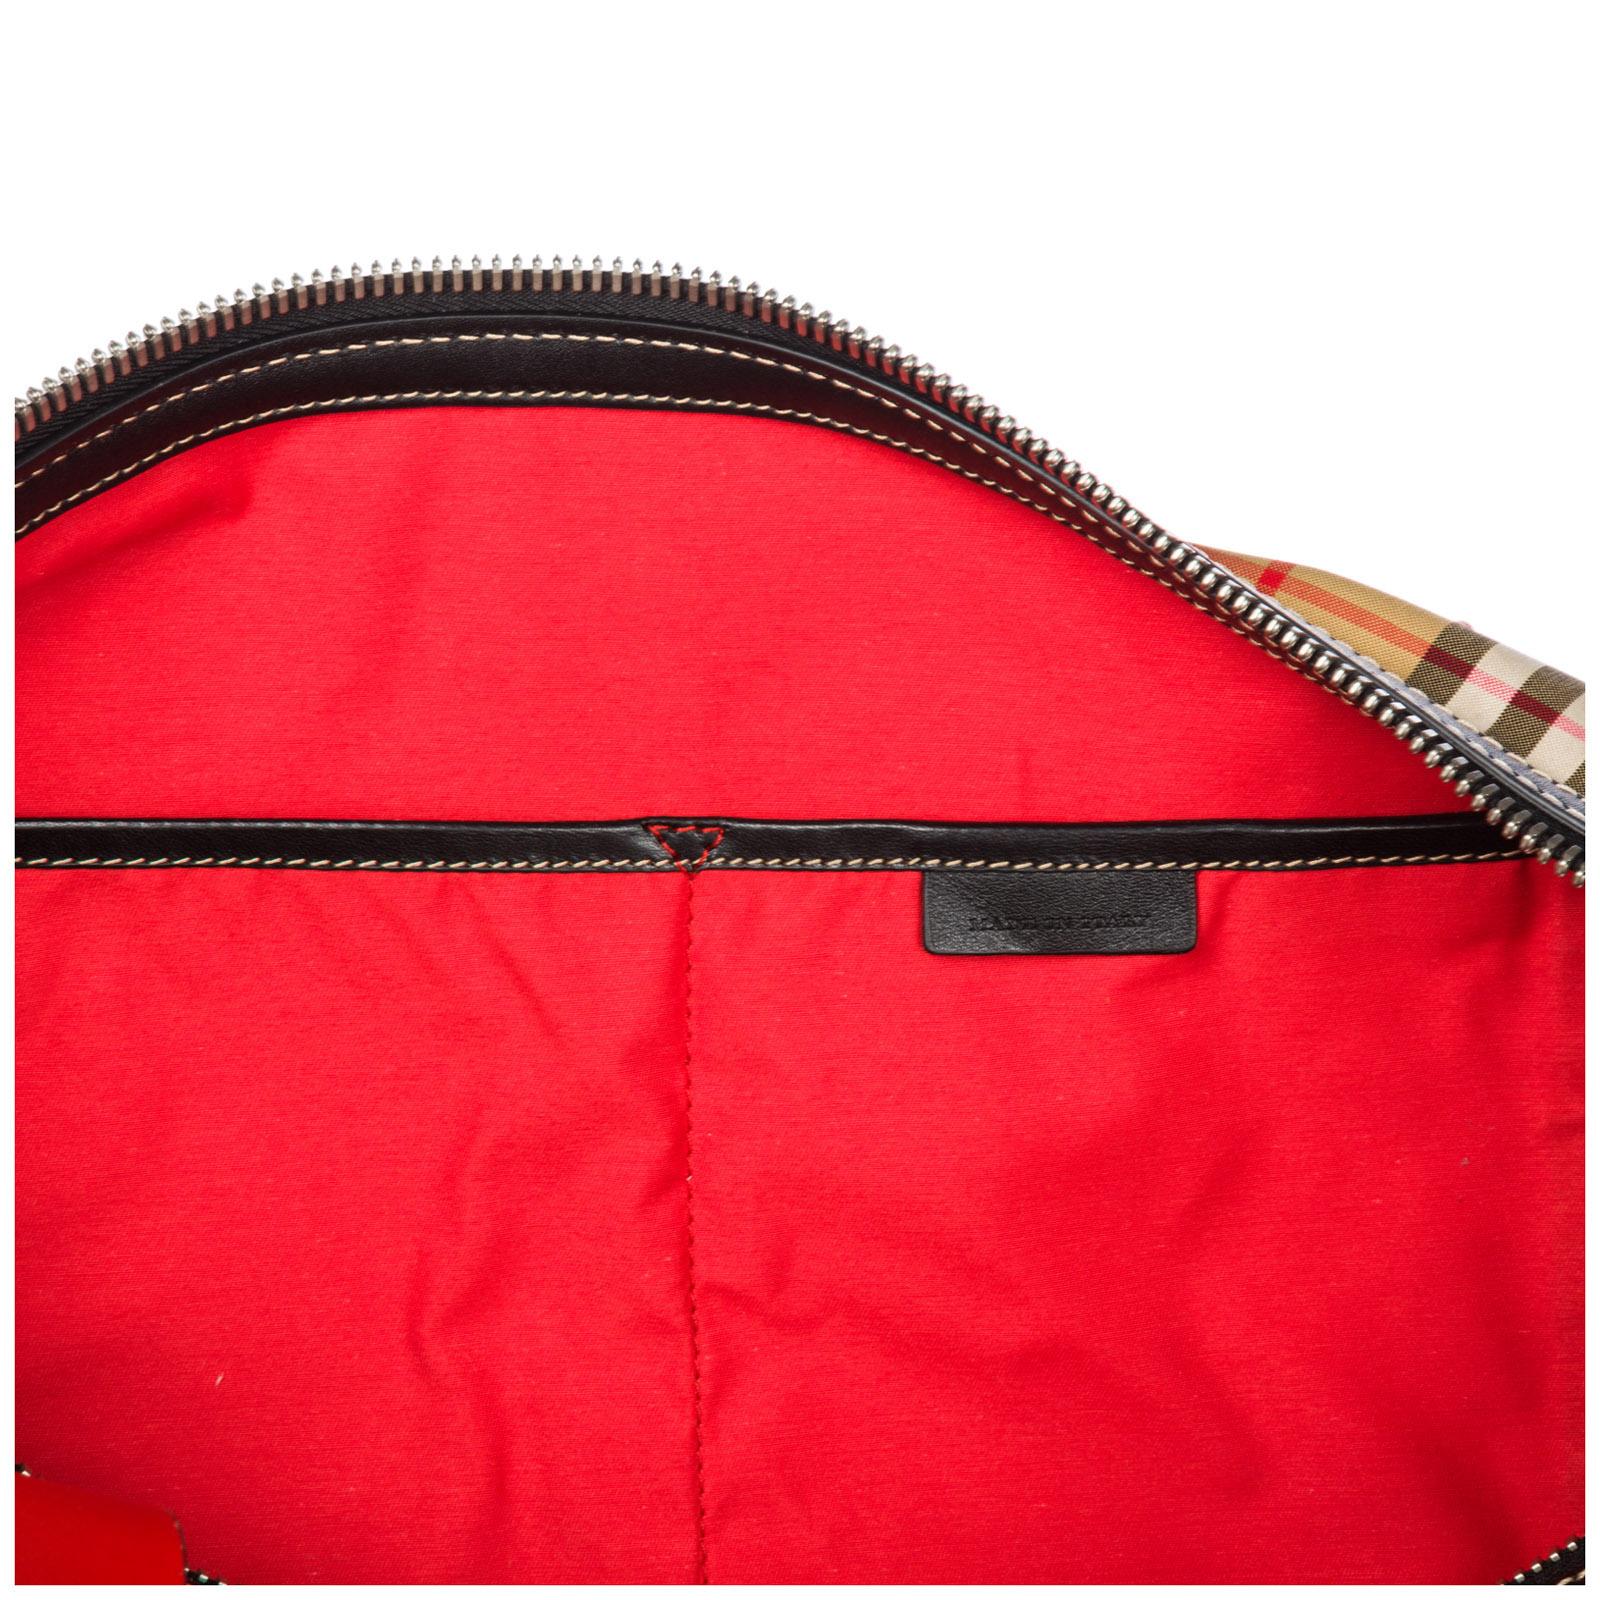 9b4c209579af Duffle bag Burberry Kennedy 40742791 military red